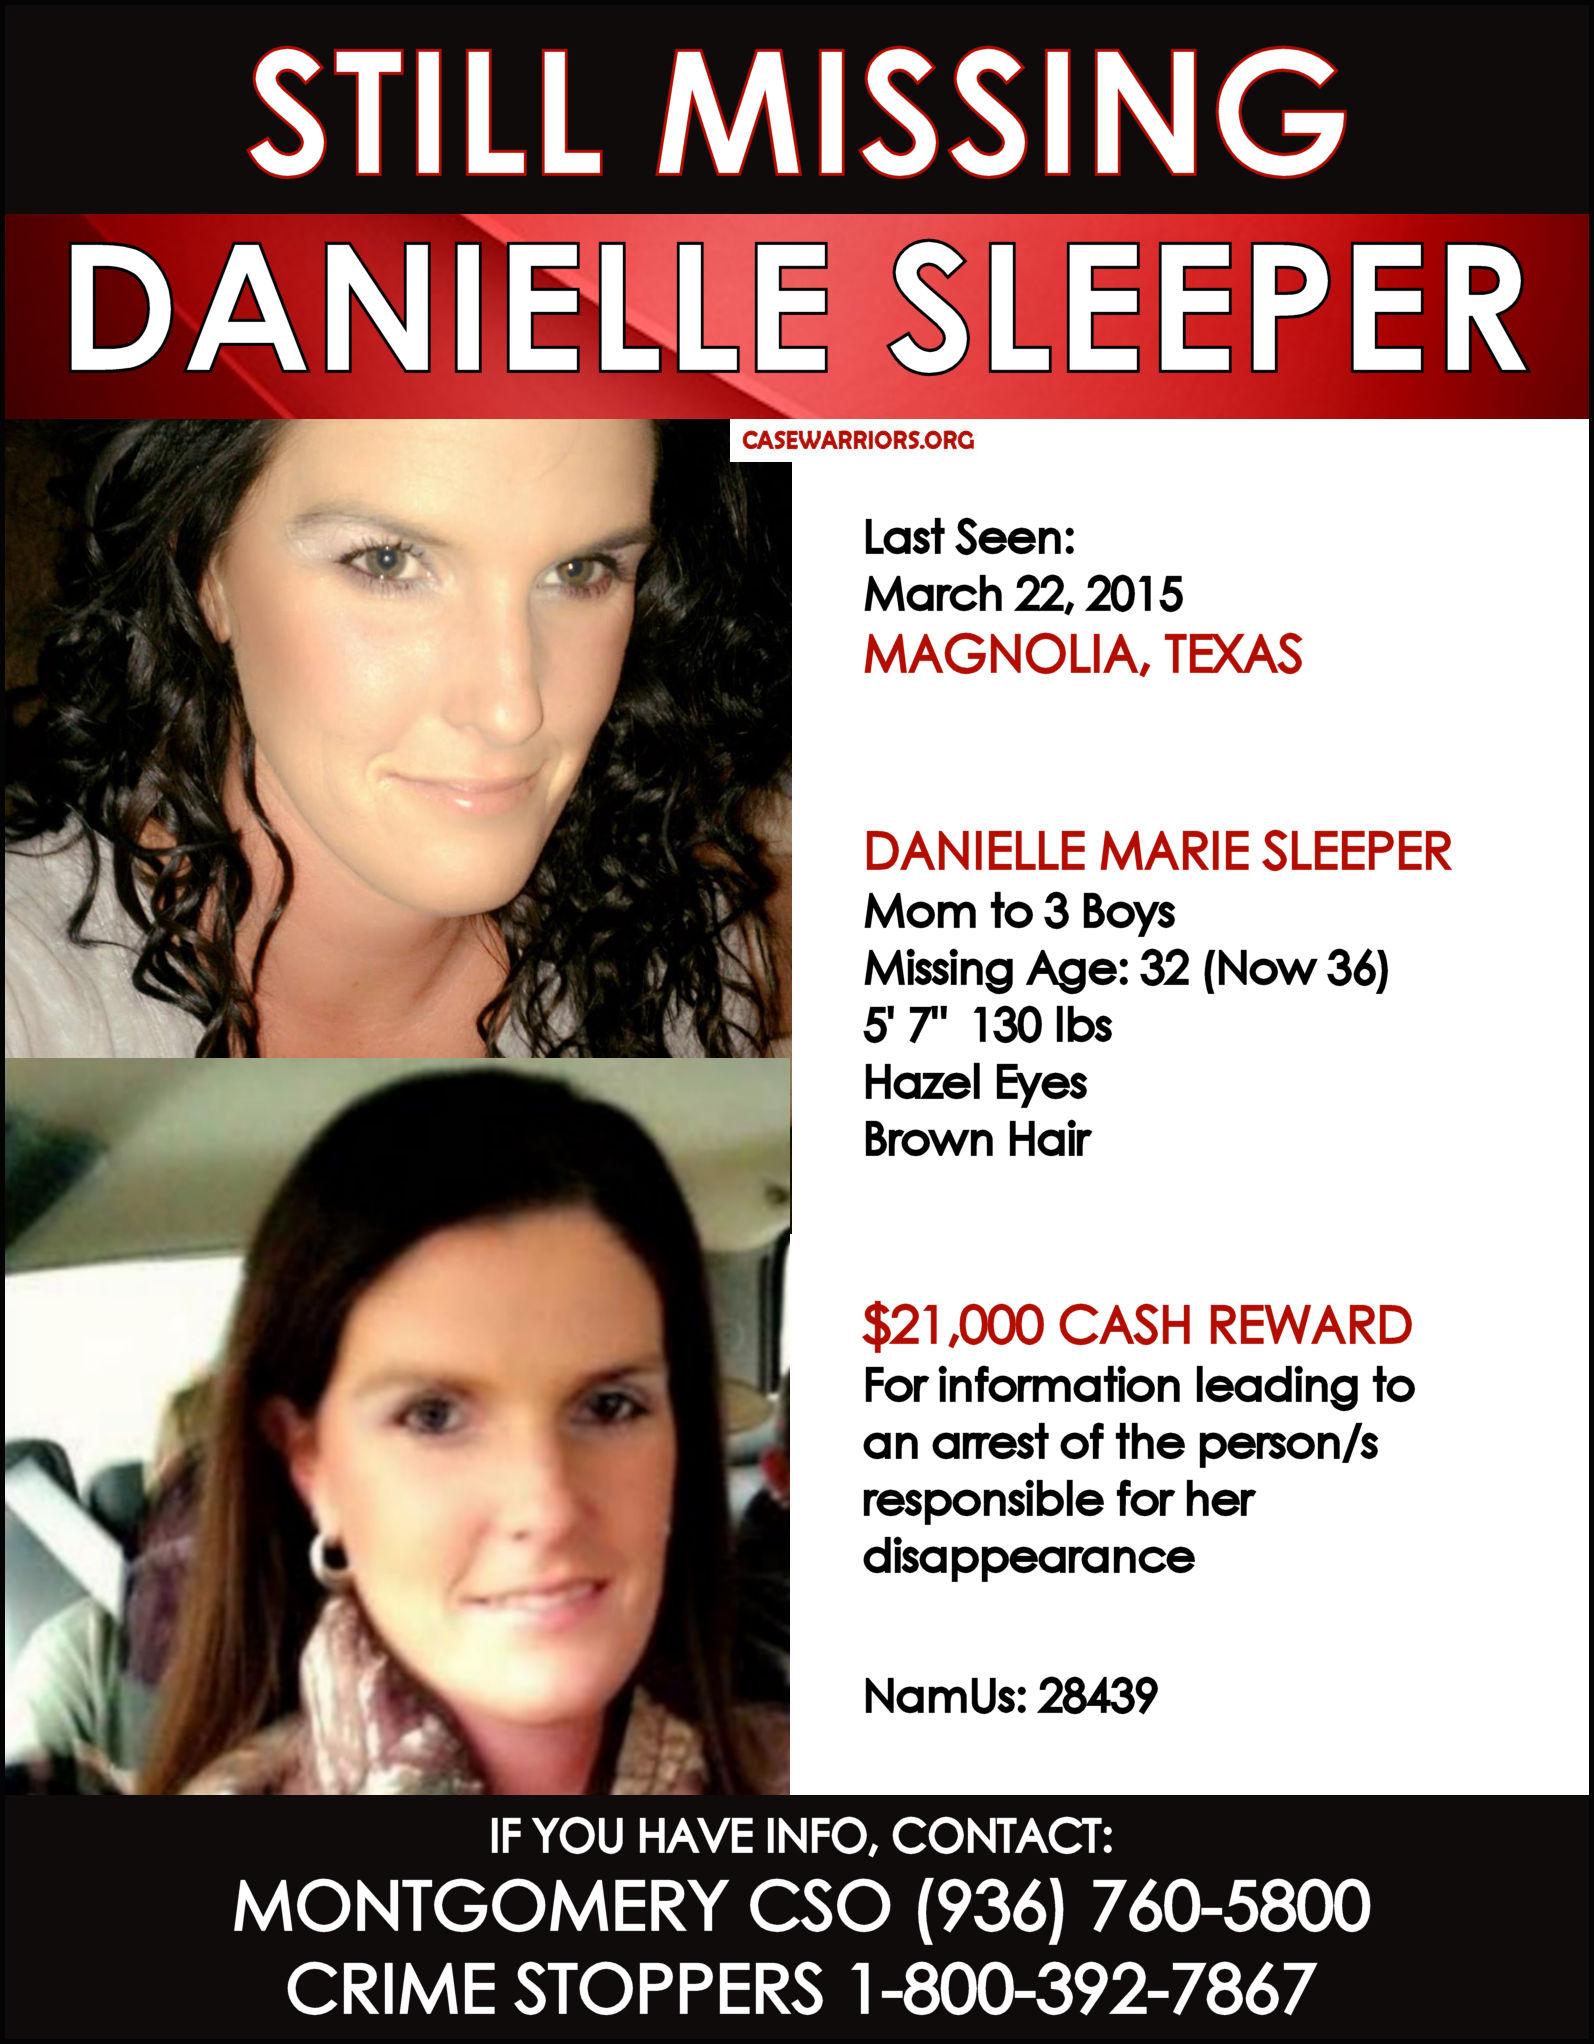 DANIELLE SLEEPER